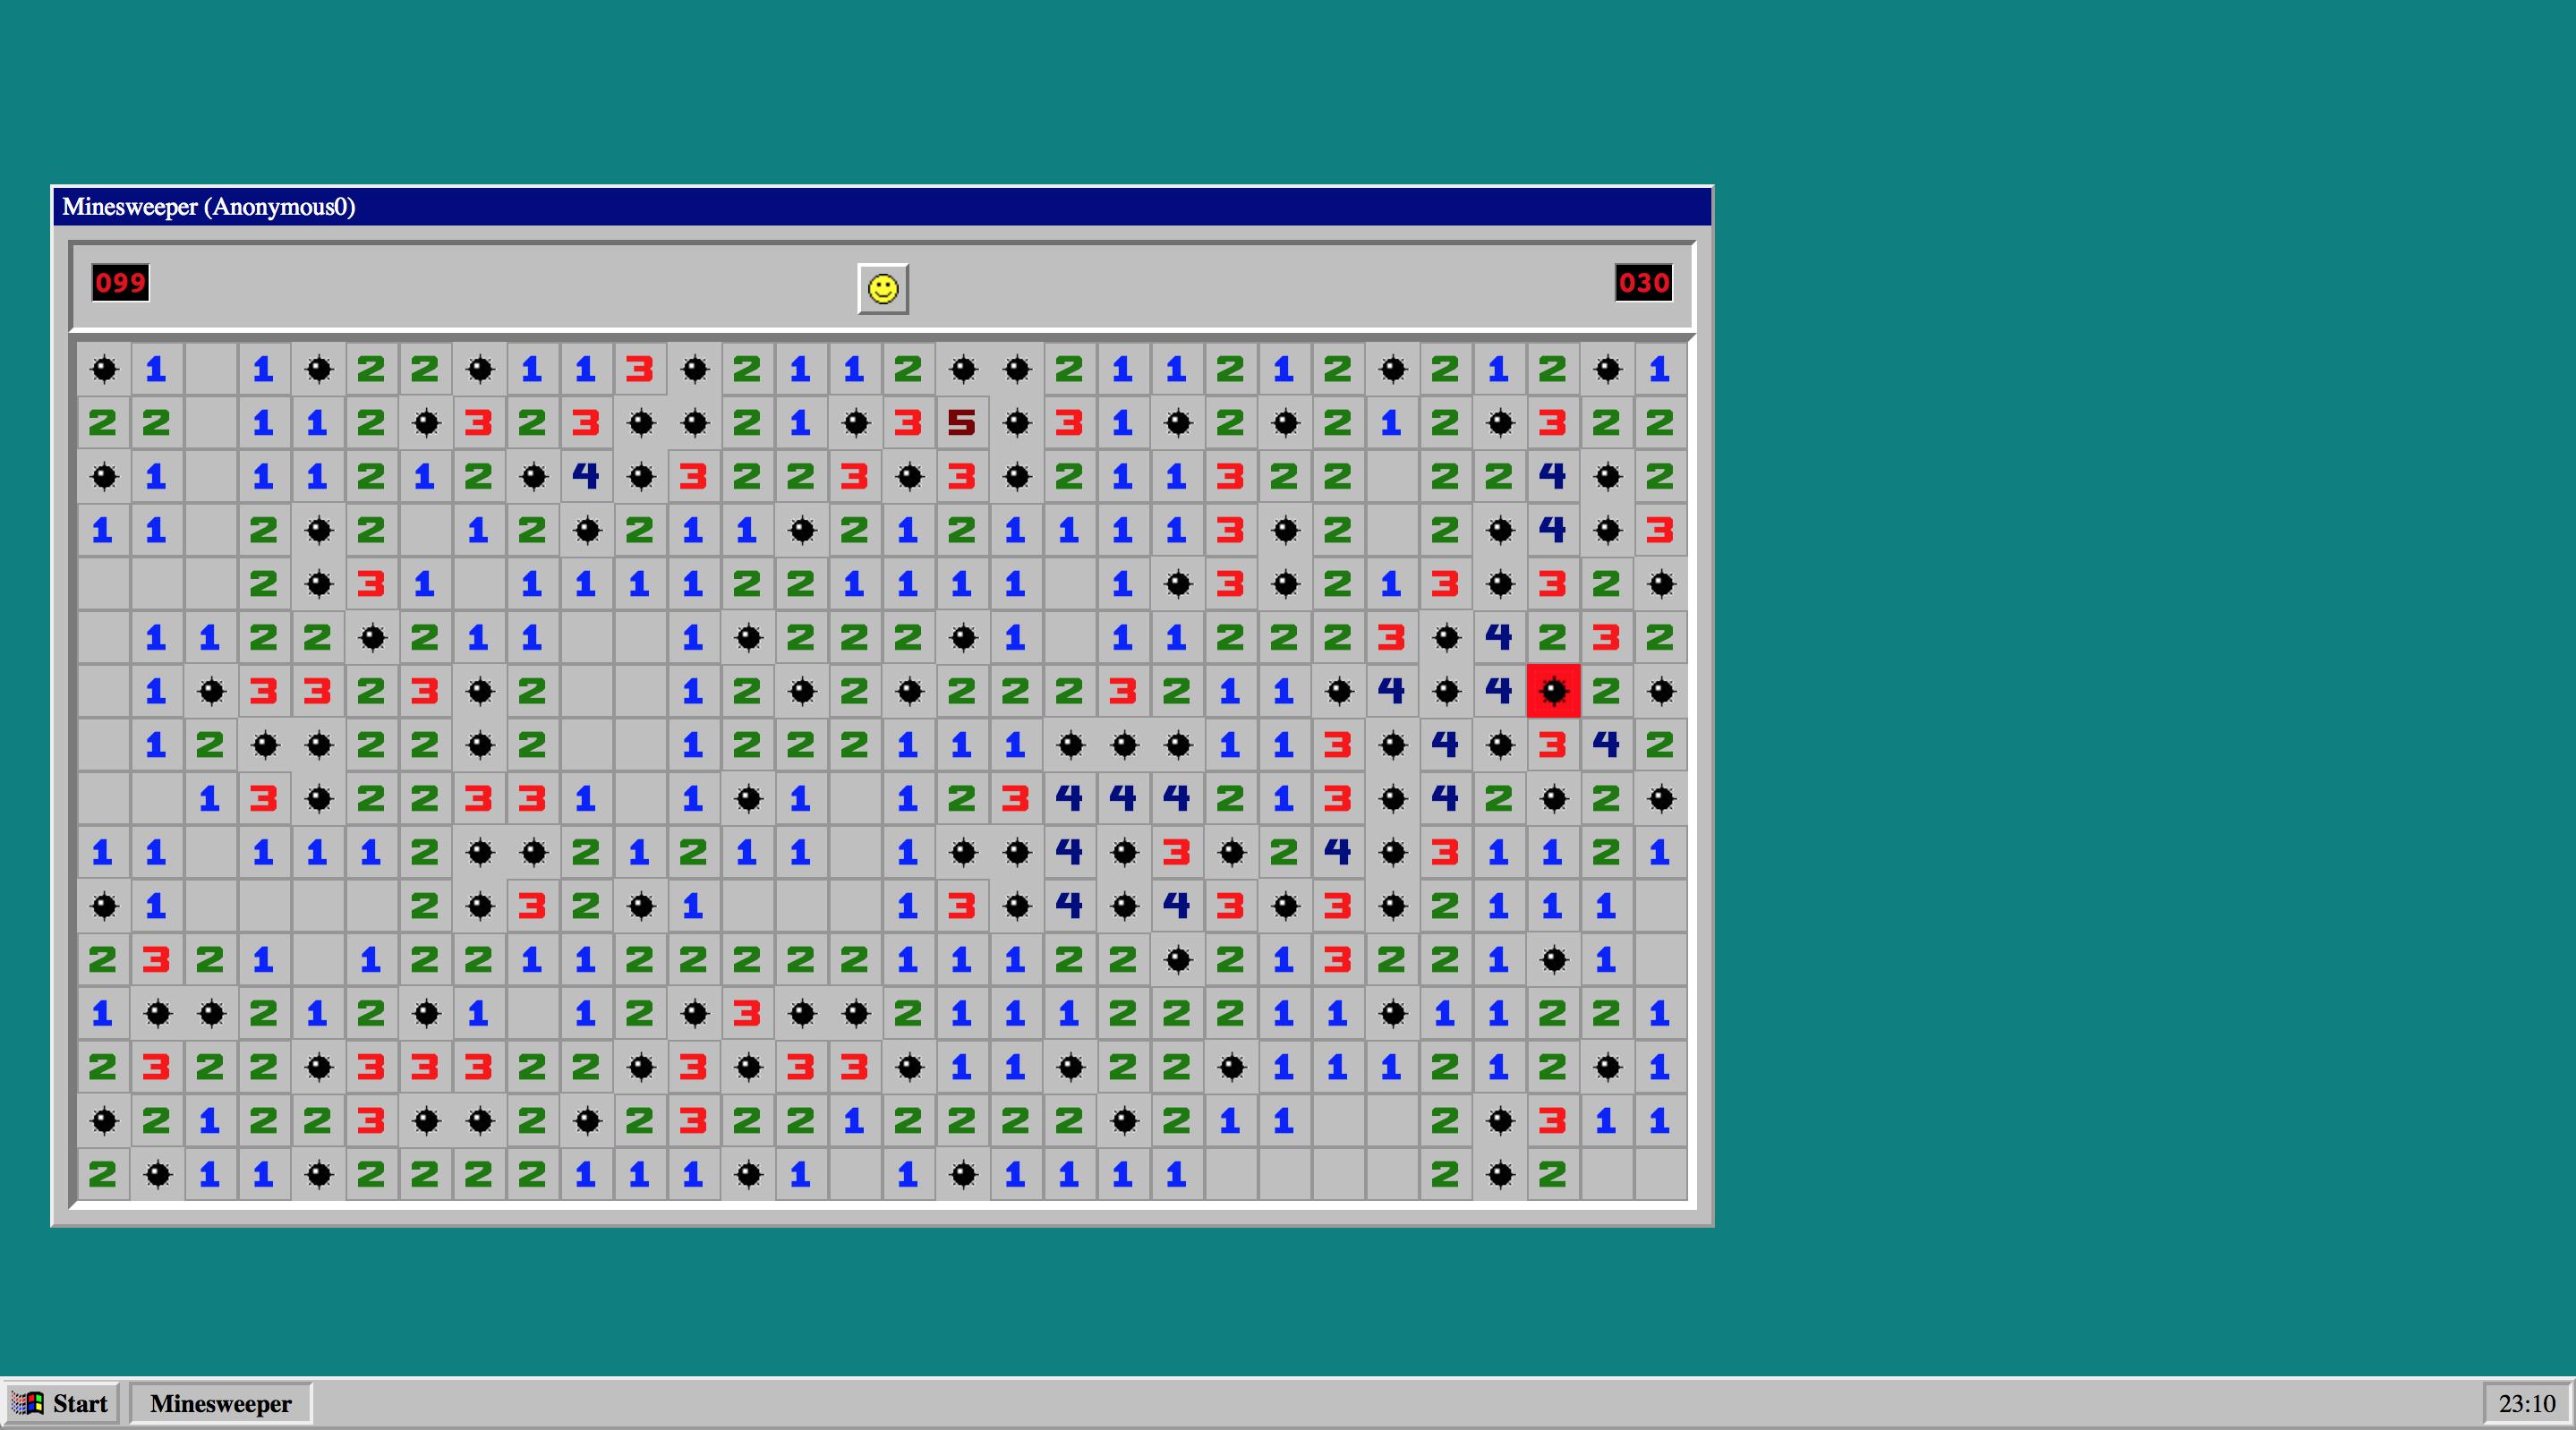 GitHub - rkoptev/minesweeper: Platform for minesweeper bot writing